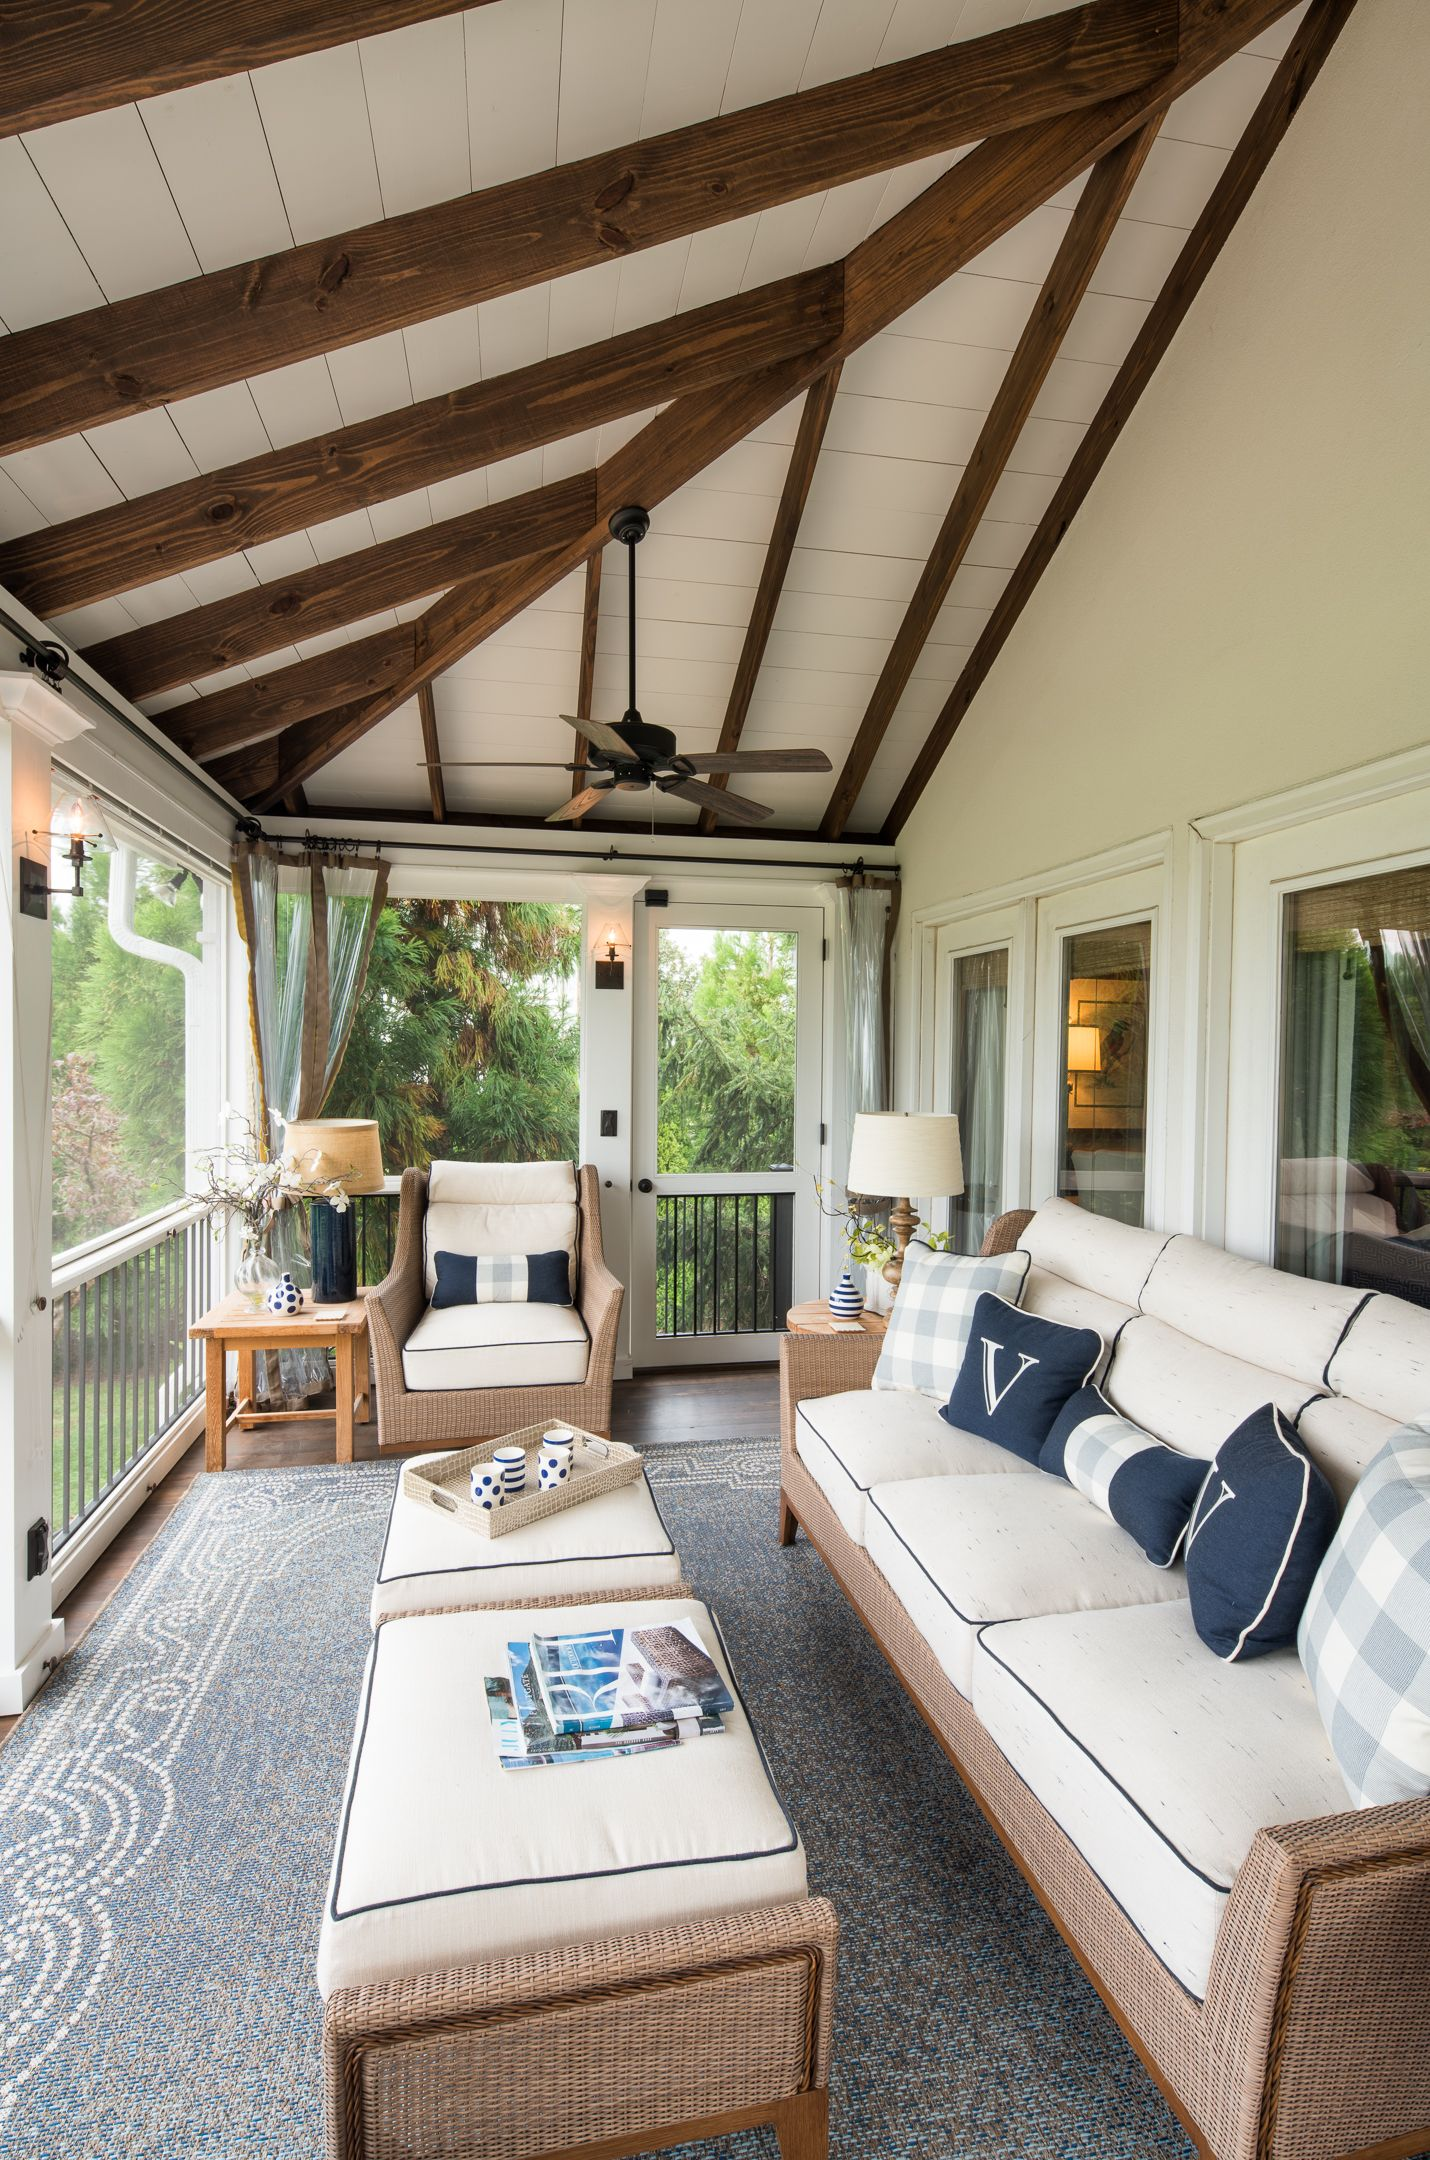 Pin de Carolin Ses en muebles para jardin | Pinterest | Muebles para ...